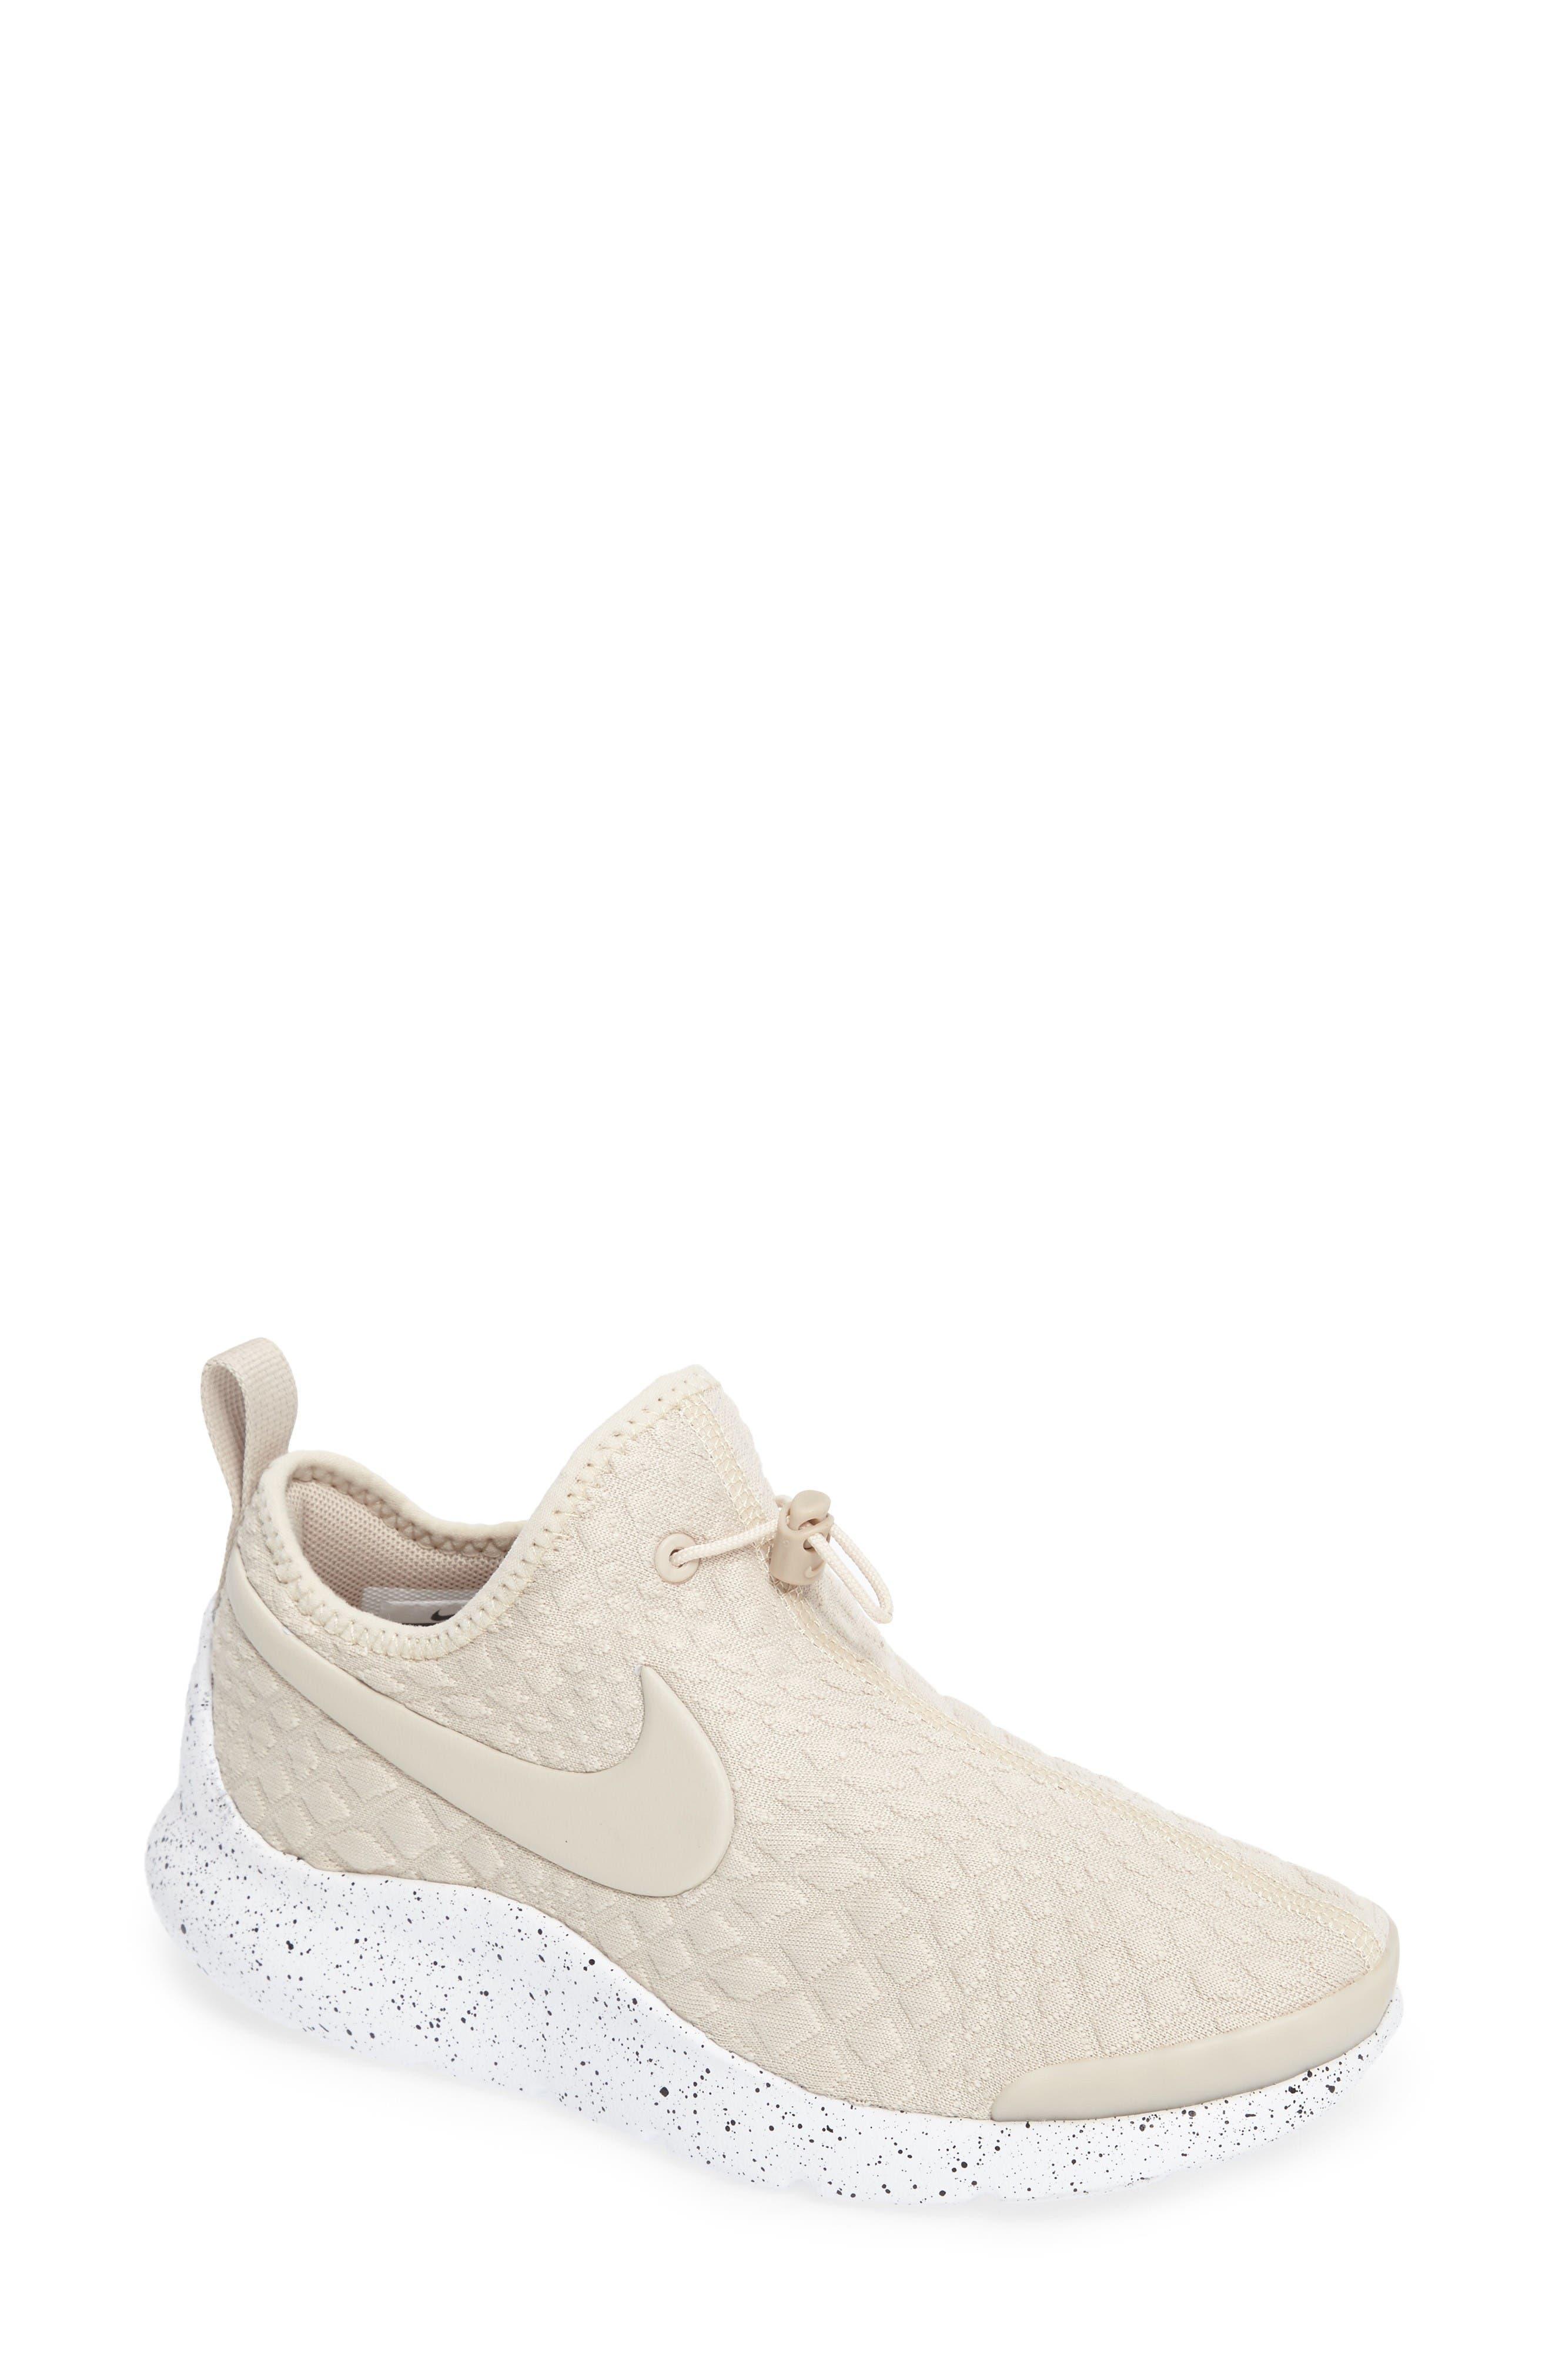 Alternate Image 1 Selected - Nike Aptare Sneaker (Women)